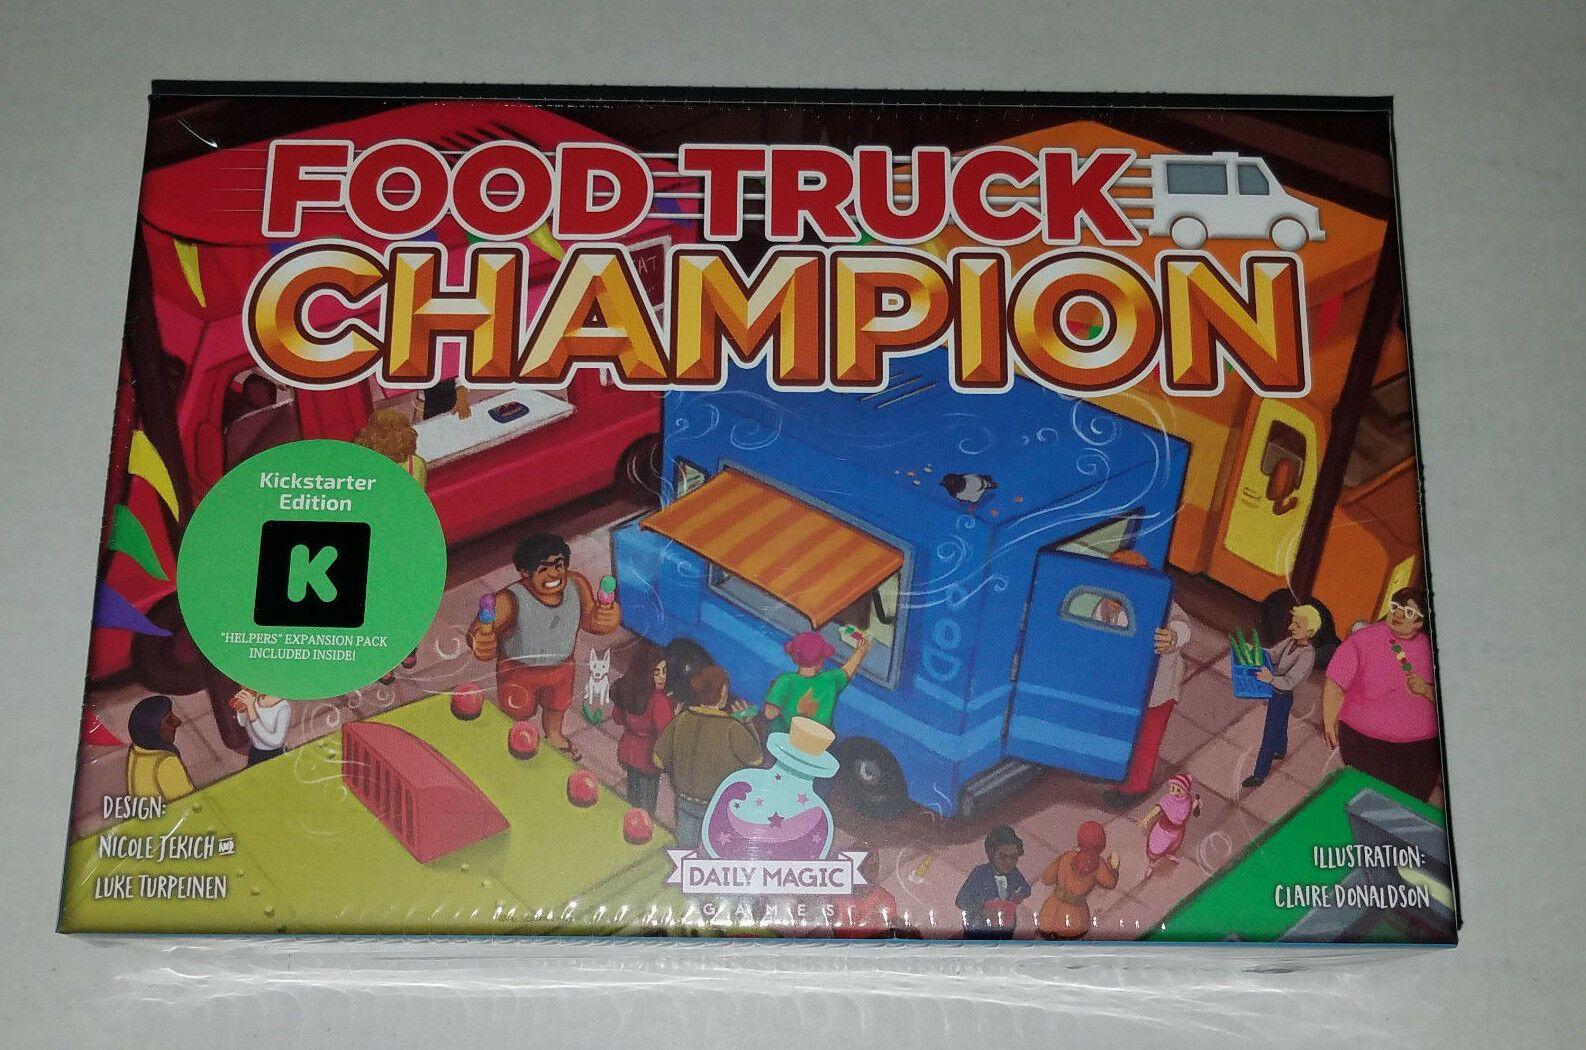 Food Truck Champion: Kickstarter Edition